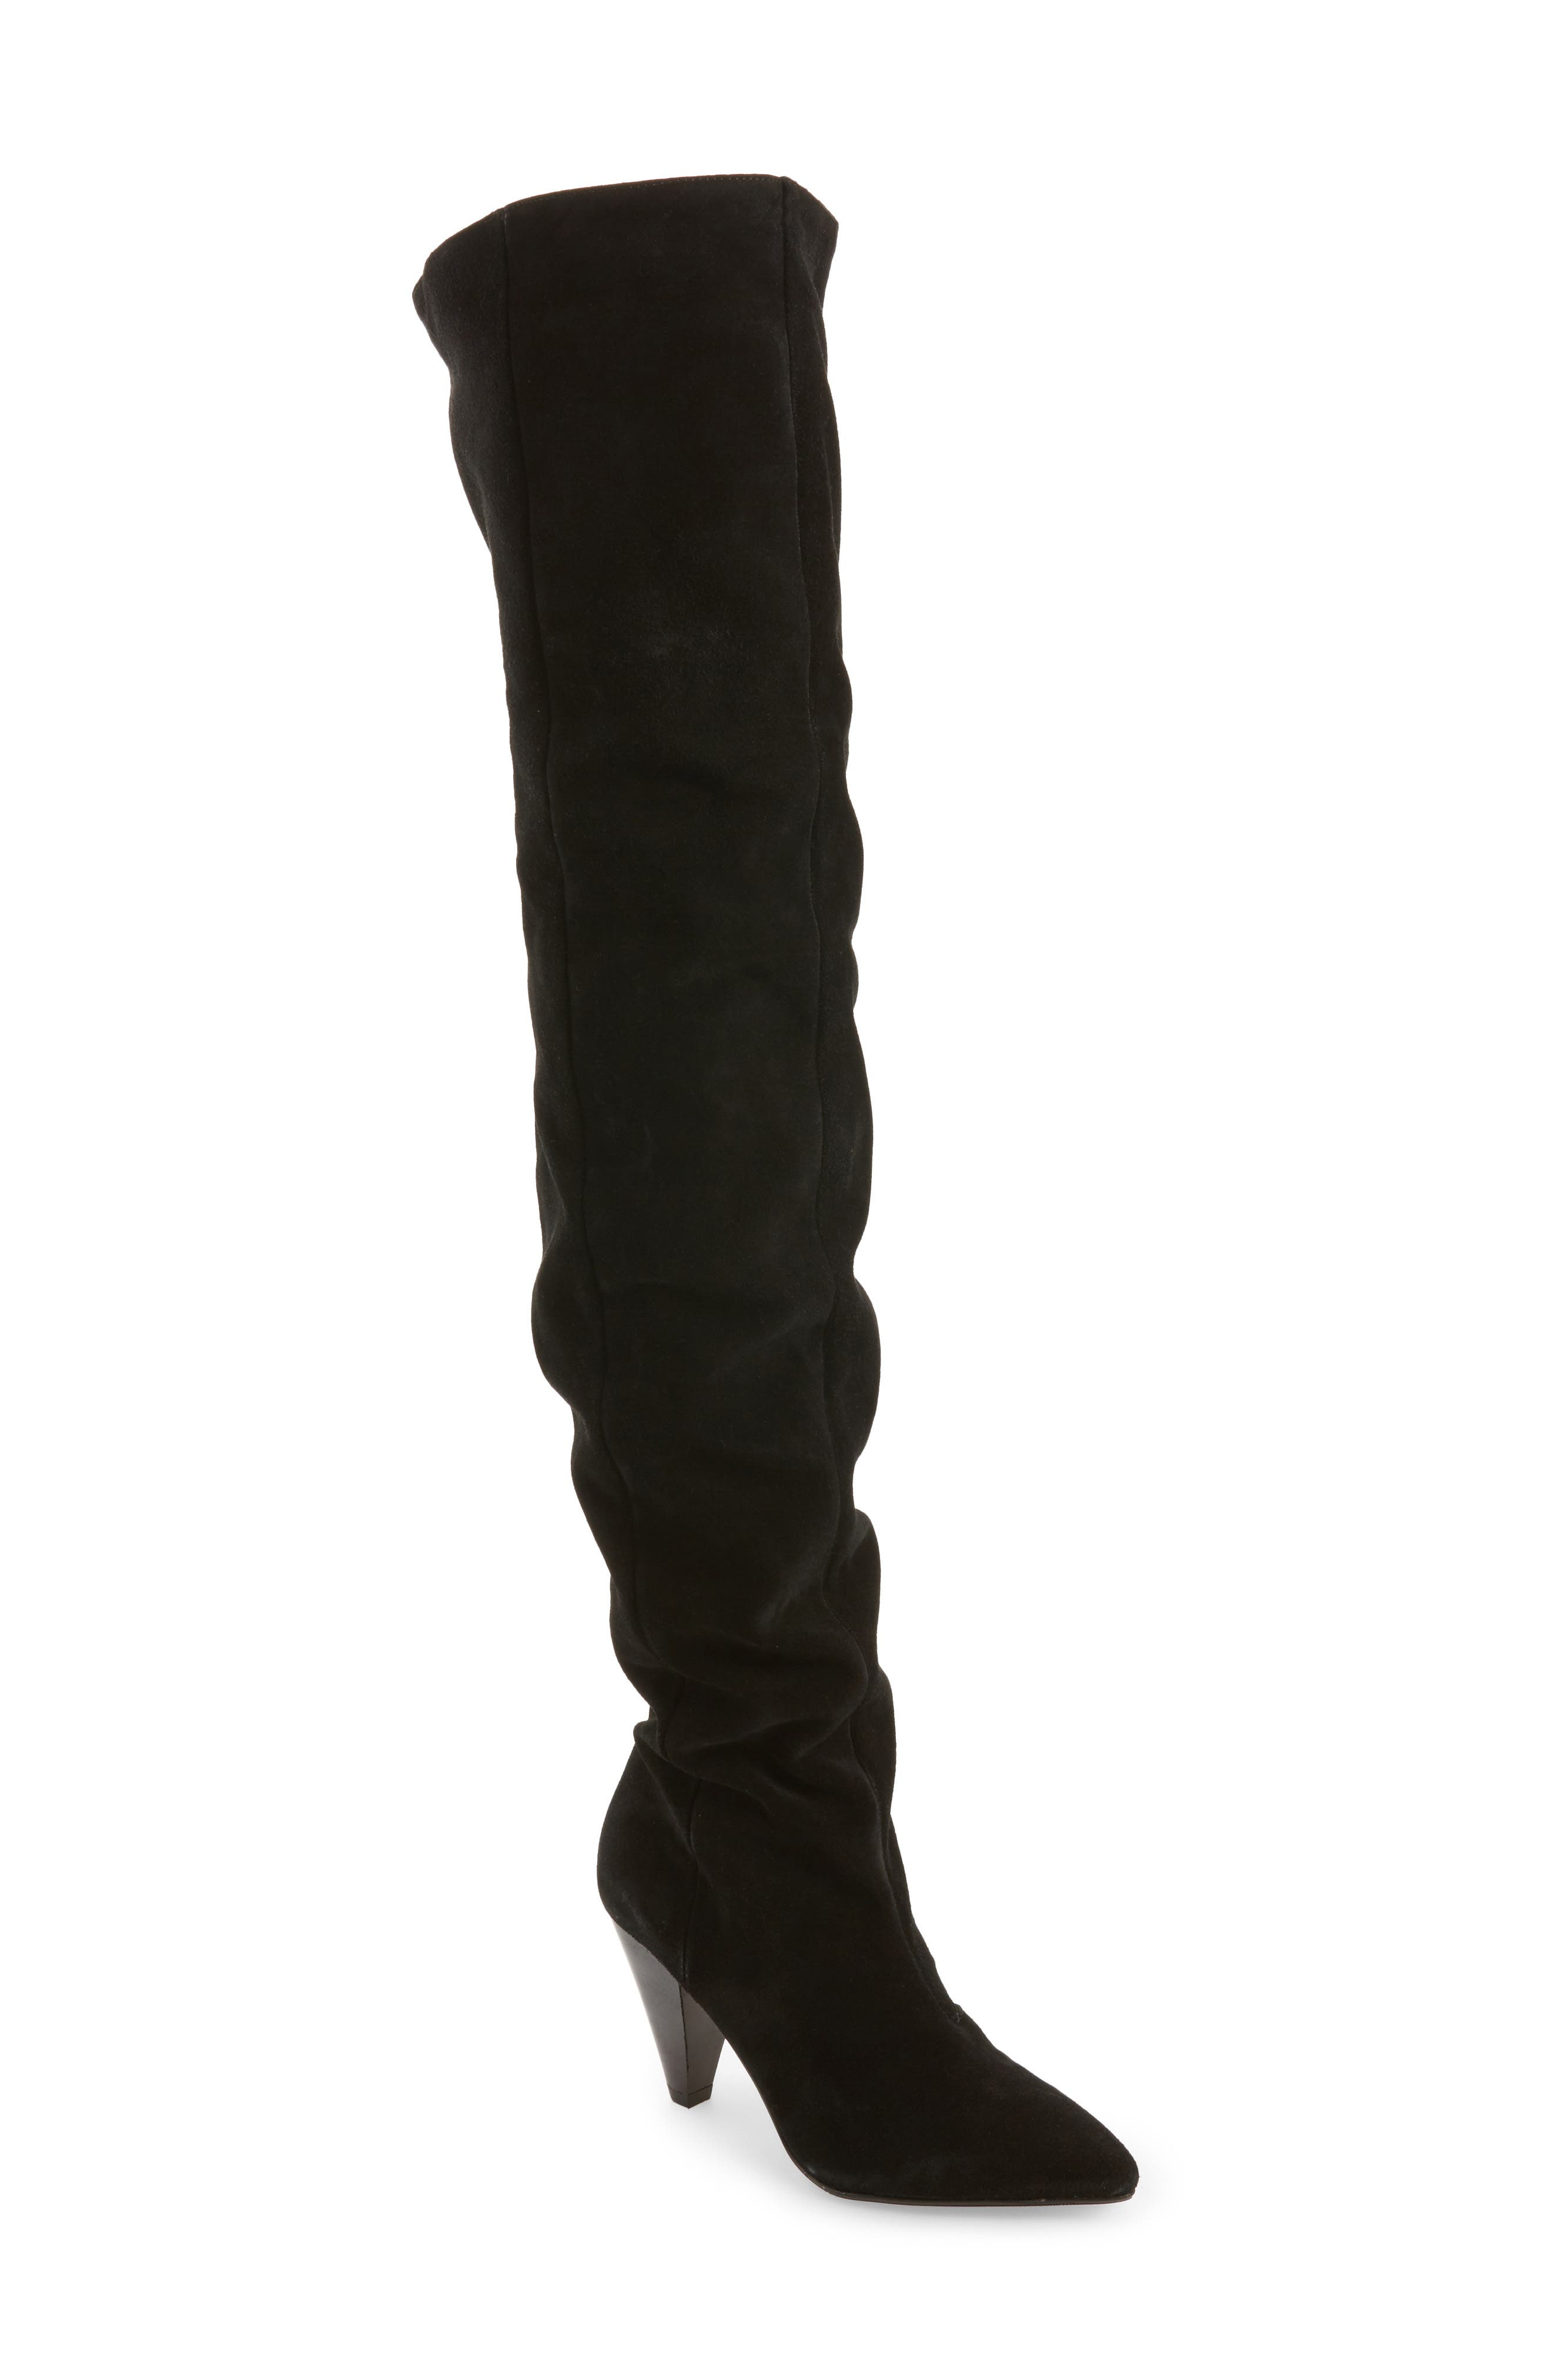 Boxer Thigh High Boots,                             Main thumbnail 1, color,                             001